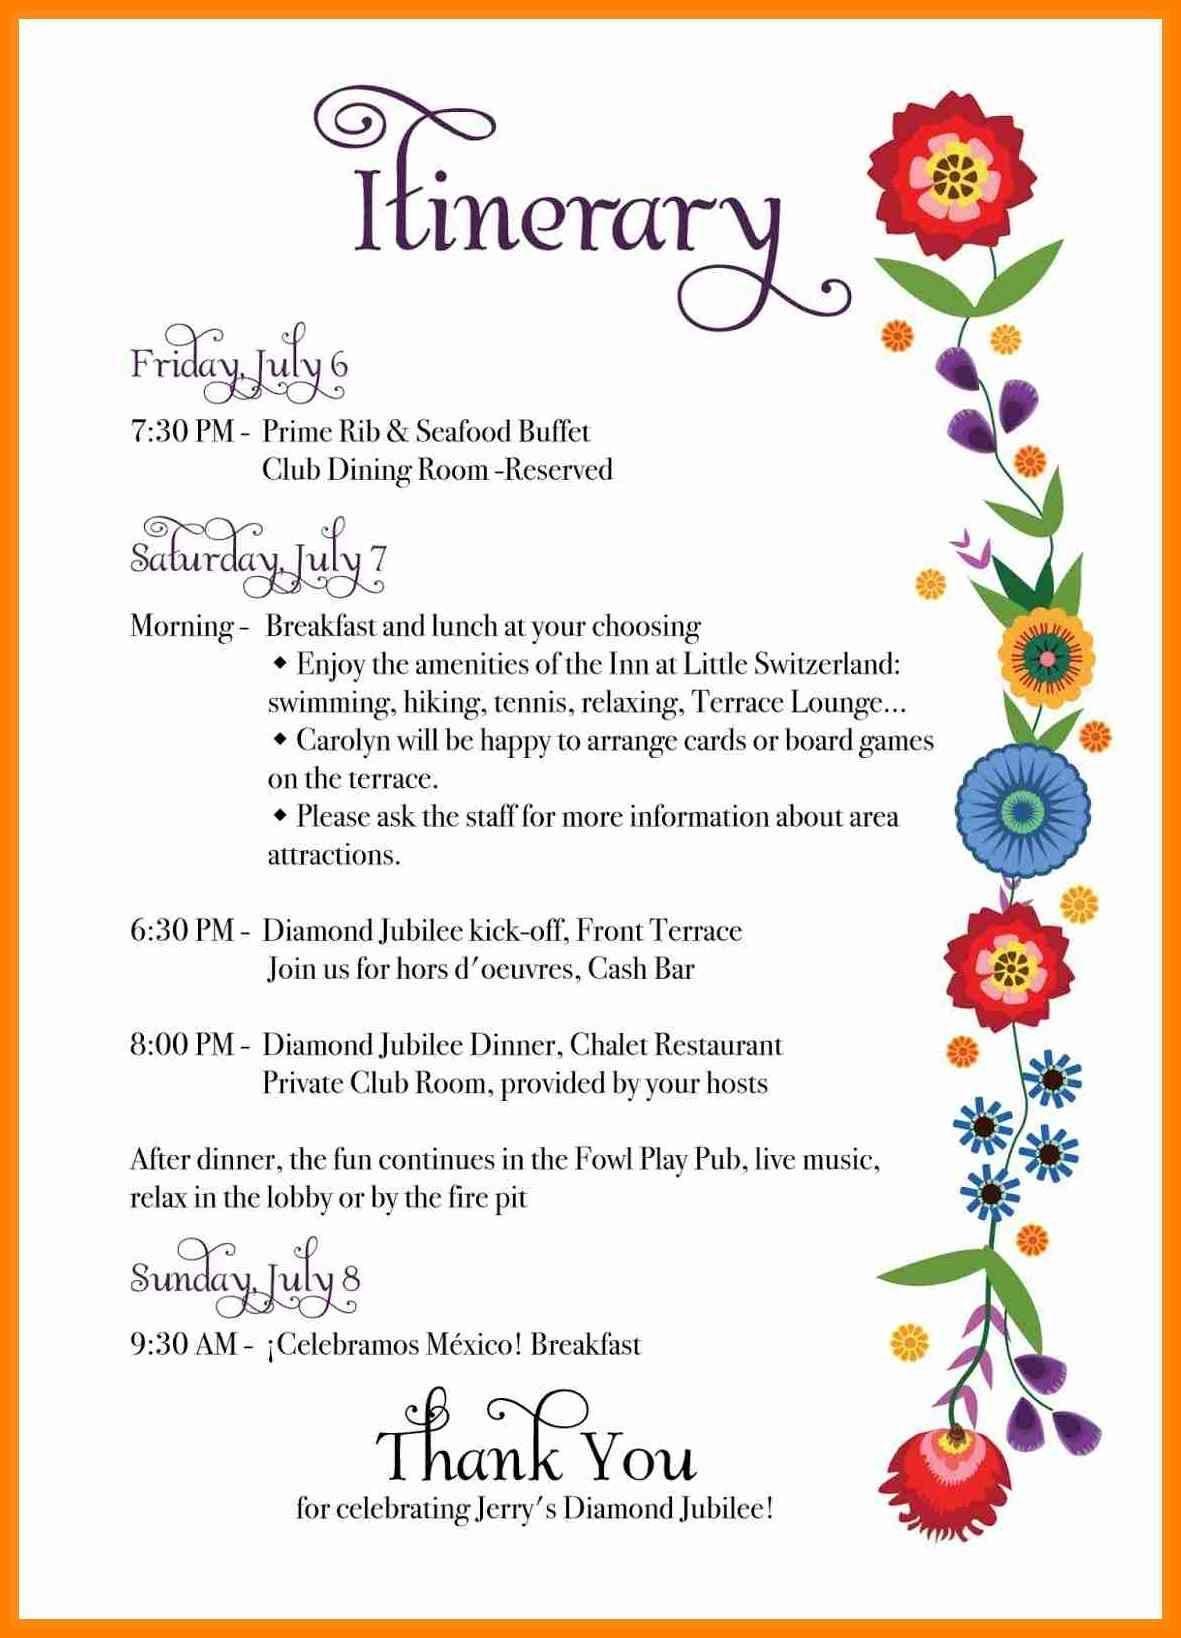 Itinerary Template Itinerary Template Wedding Day Itinerary